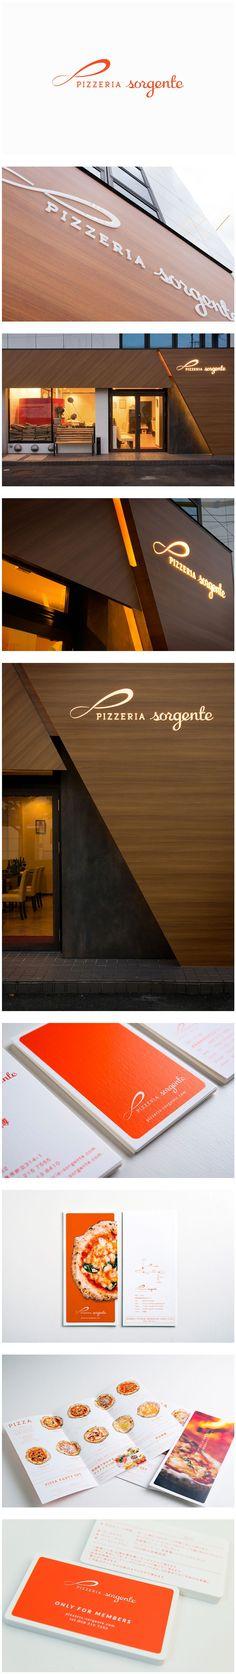 logo branding sign facade design italian pizzeria ロゴ ブランディング サイン 看板 ファサード デザイン イタリアン ピッツェリア